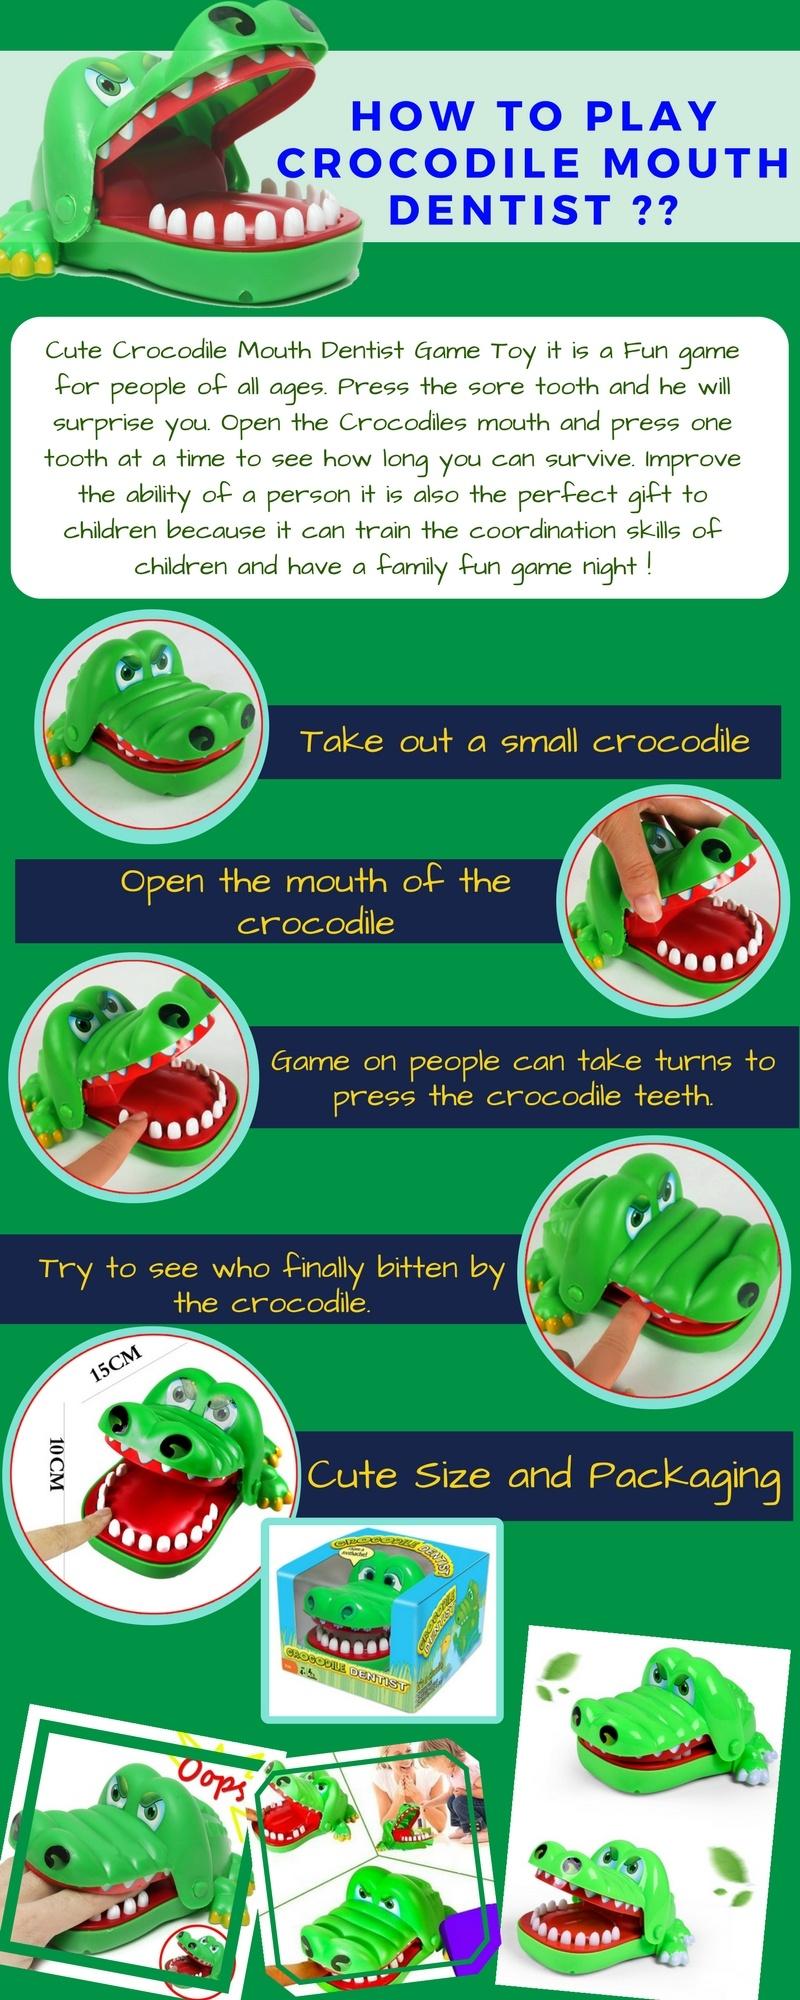 Specifications of Crocodile Dentist Bite Finger Game Buy 1 Take 1 0c20669506